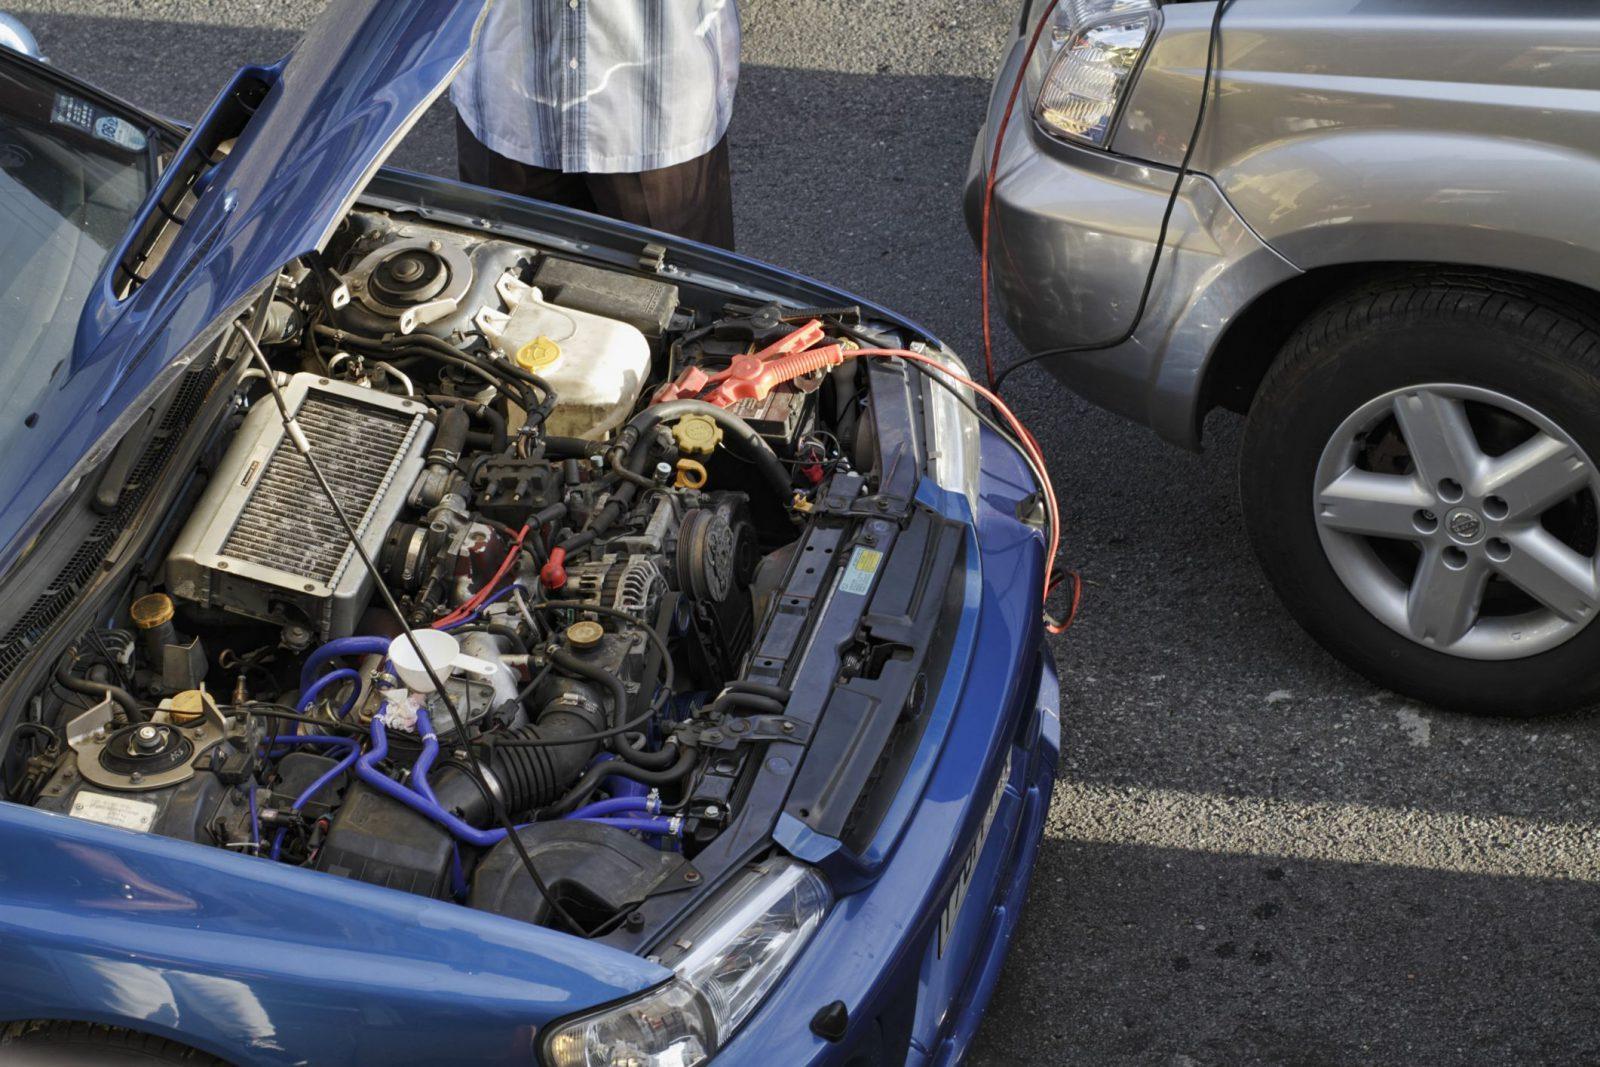 Never drive Dead battery car